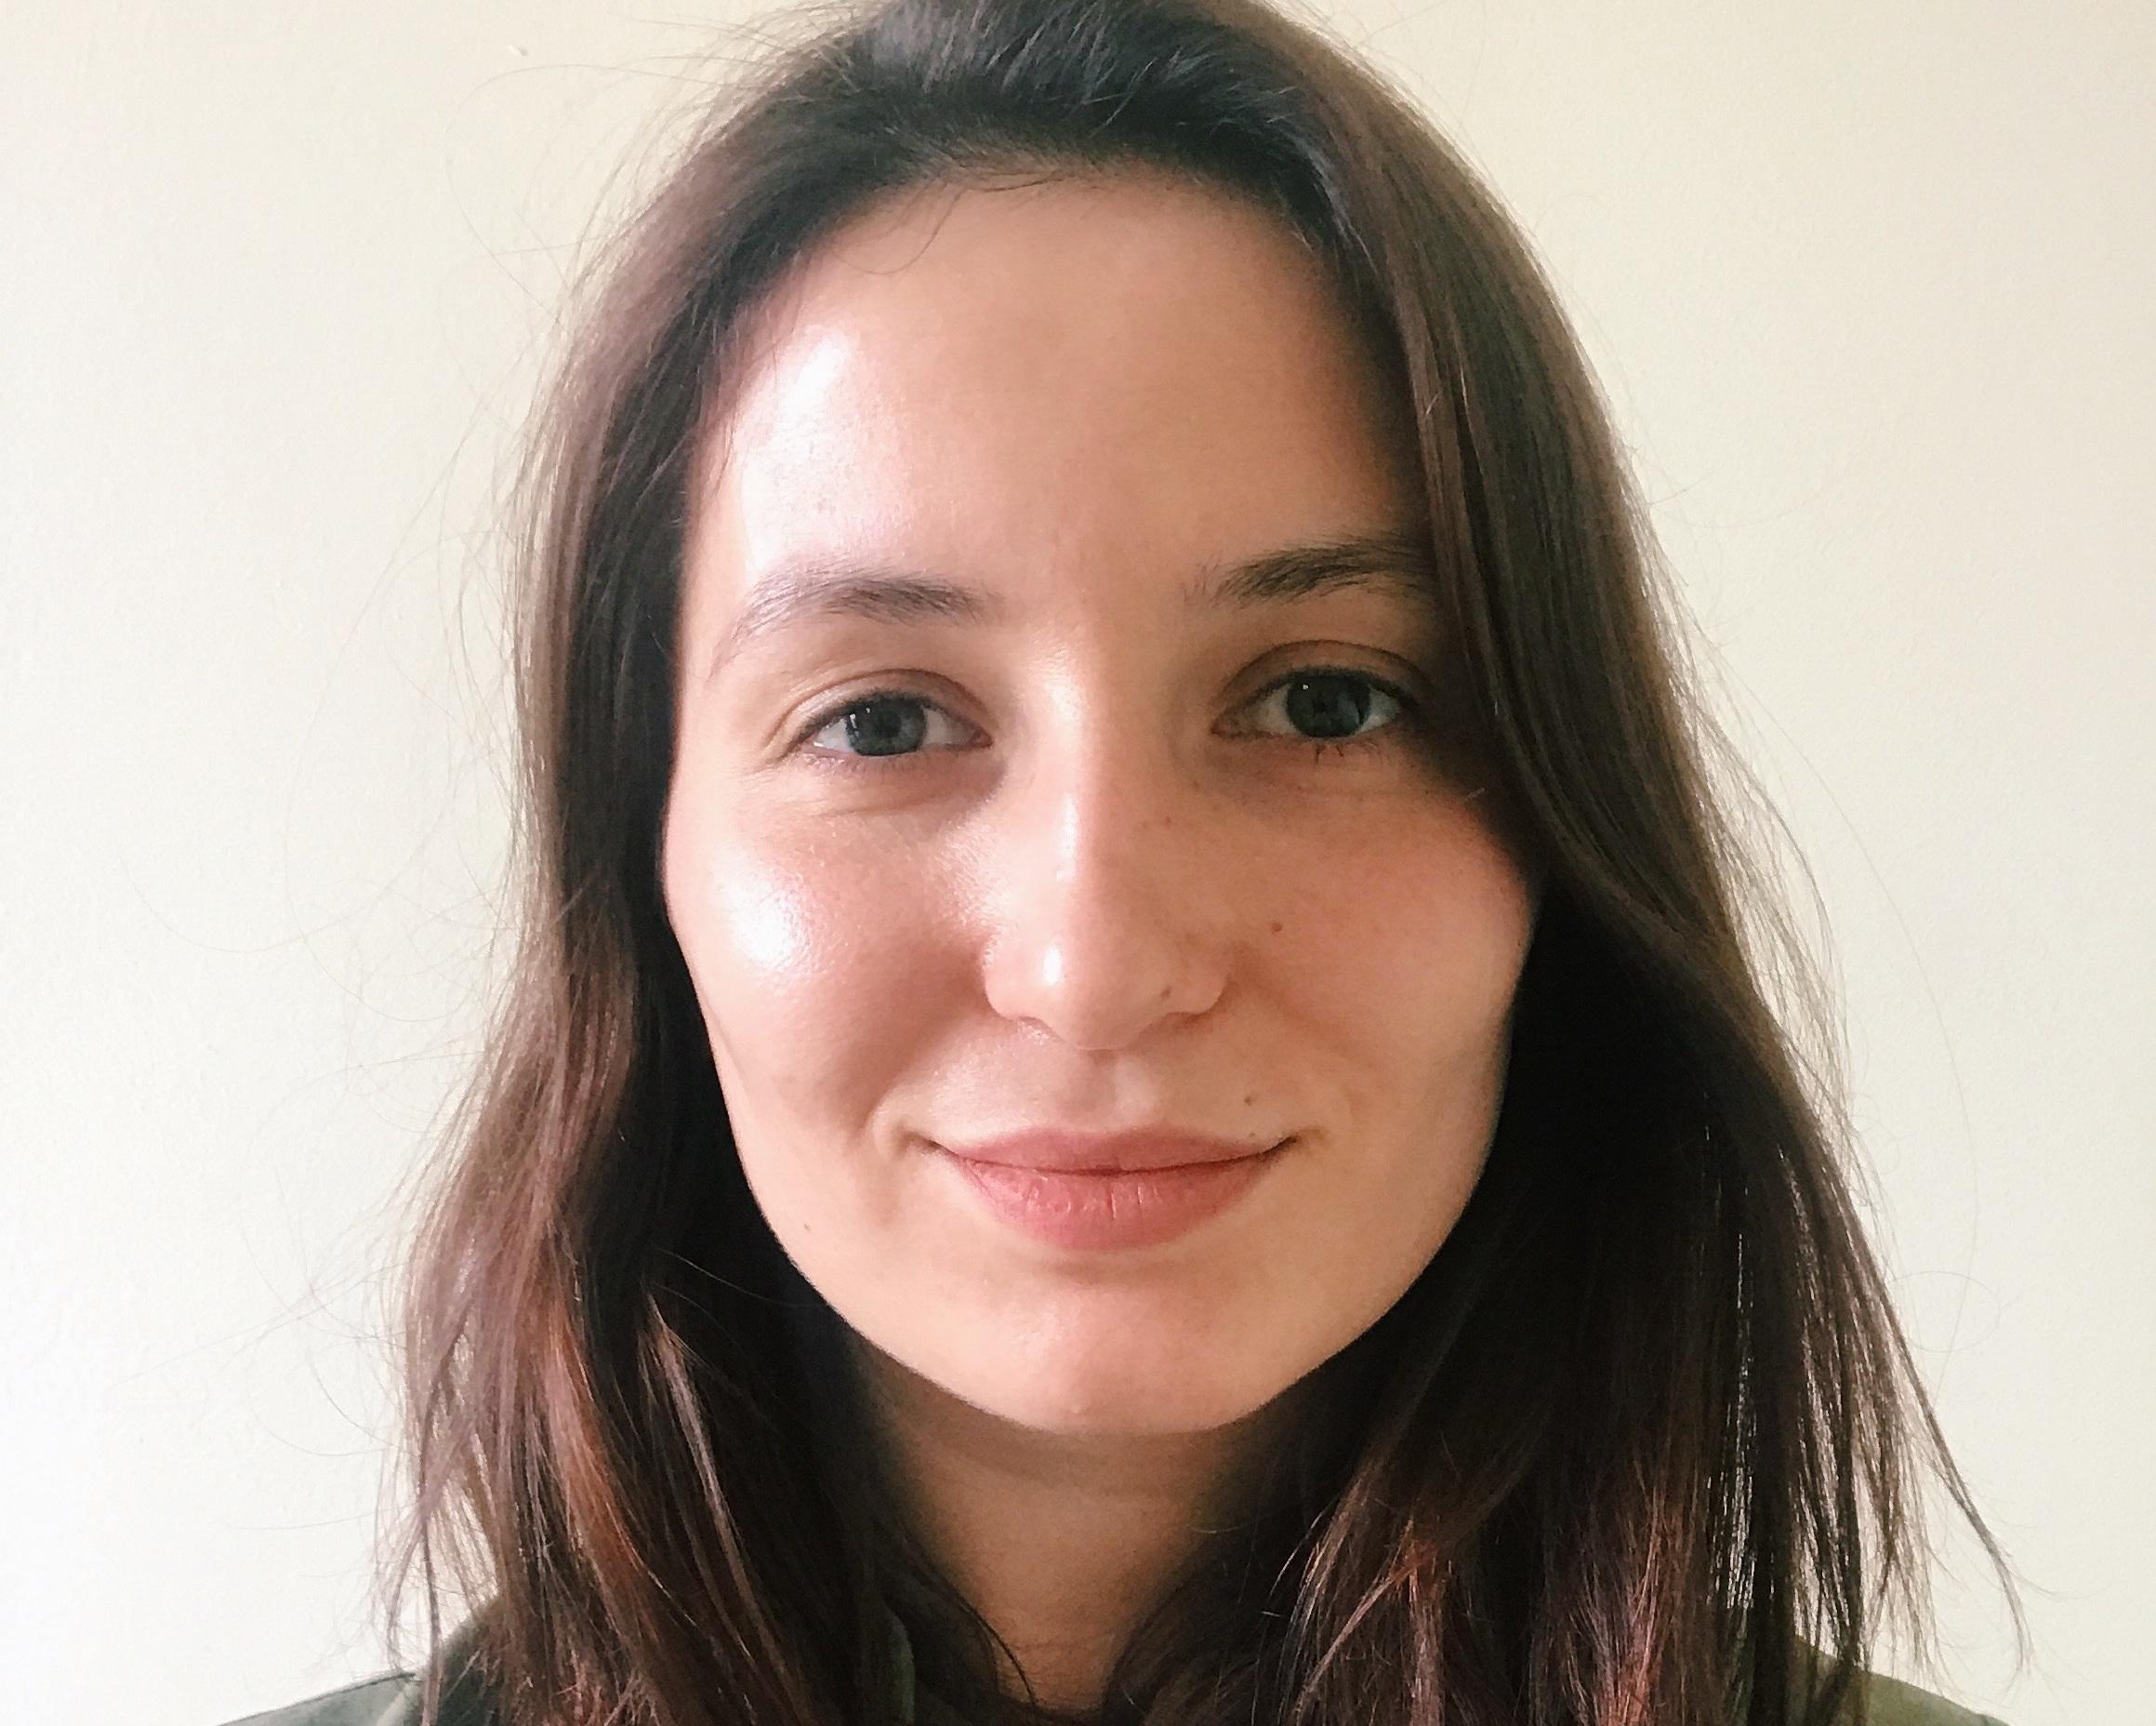 Cristina Jitari